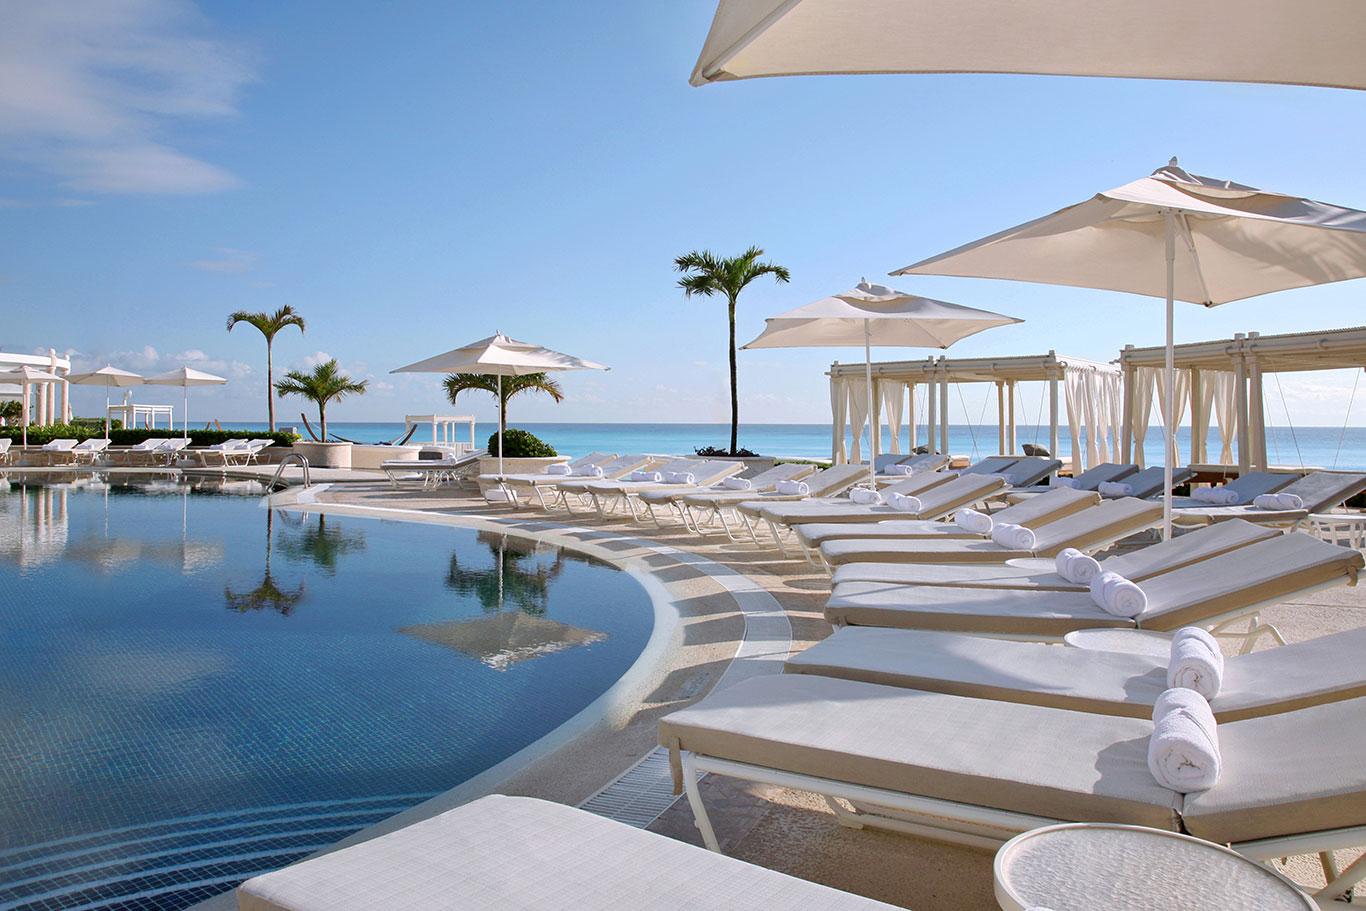 Sandos cancun luxury experience resort cancun mexico